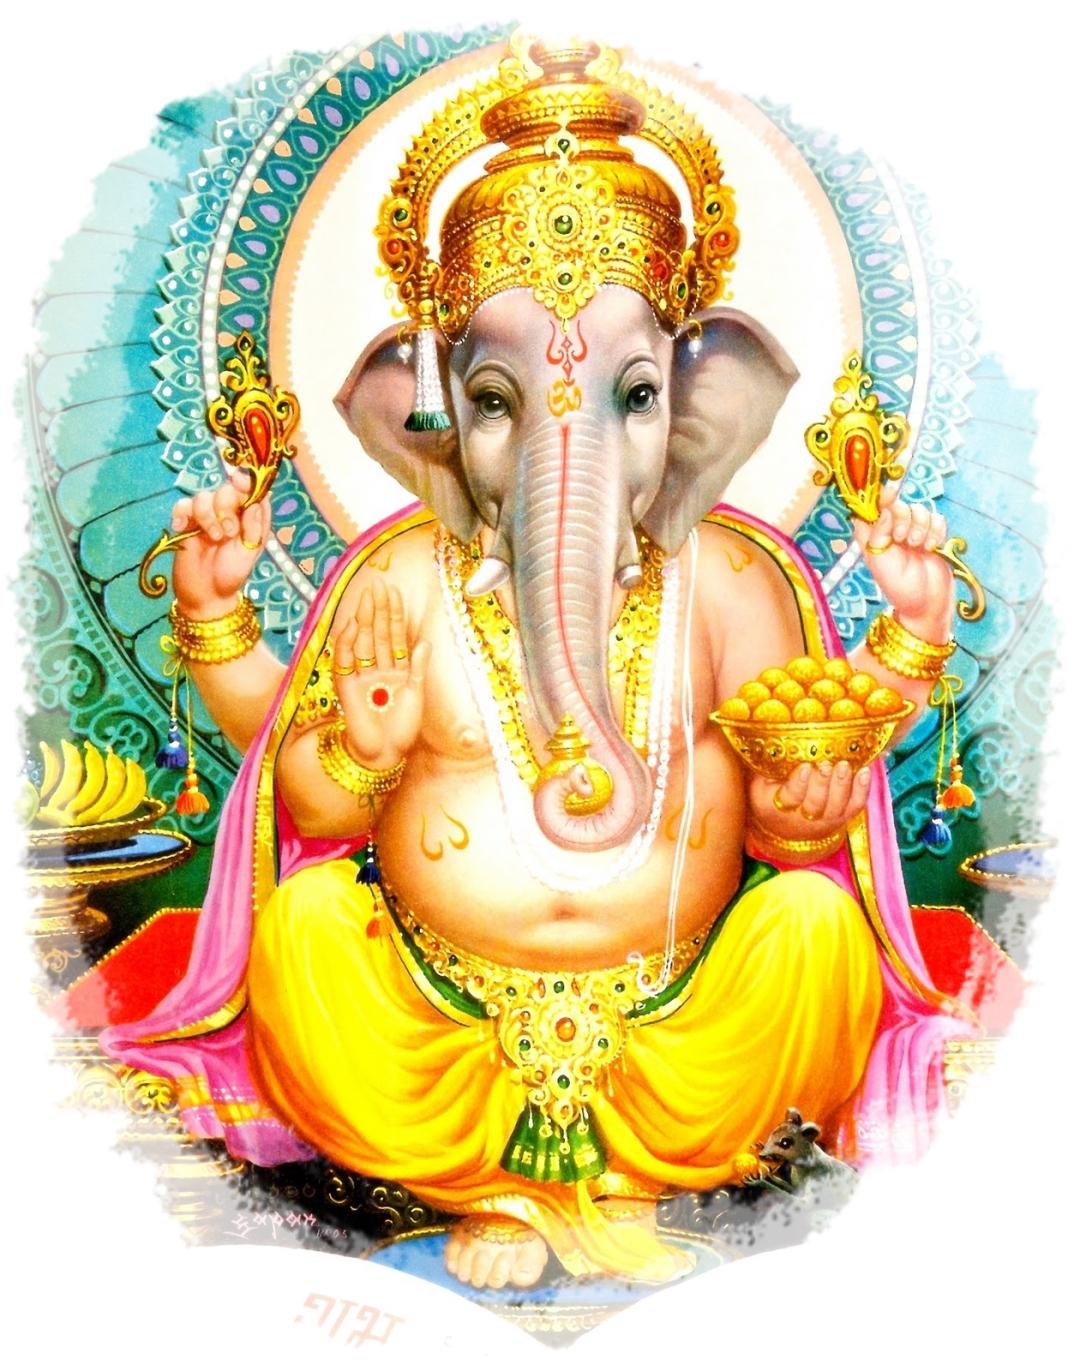 Lord Ganesha2.jpg